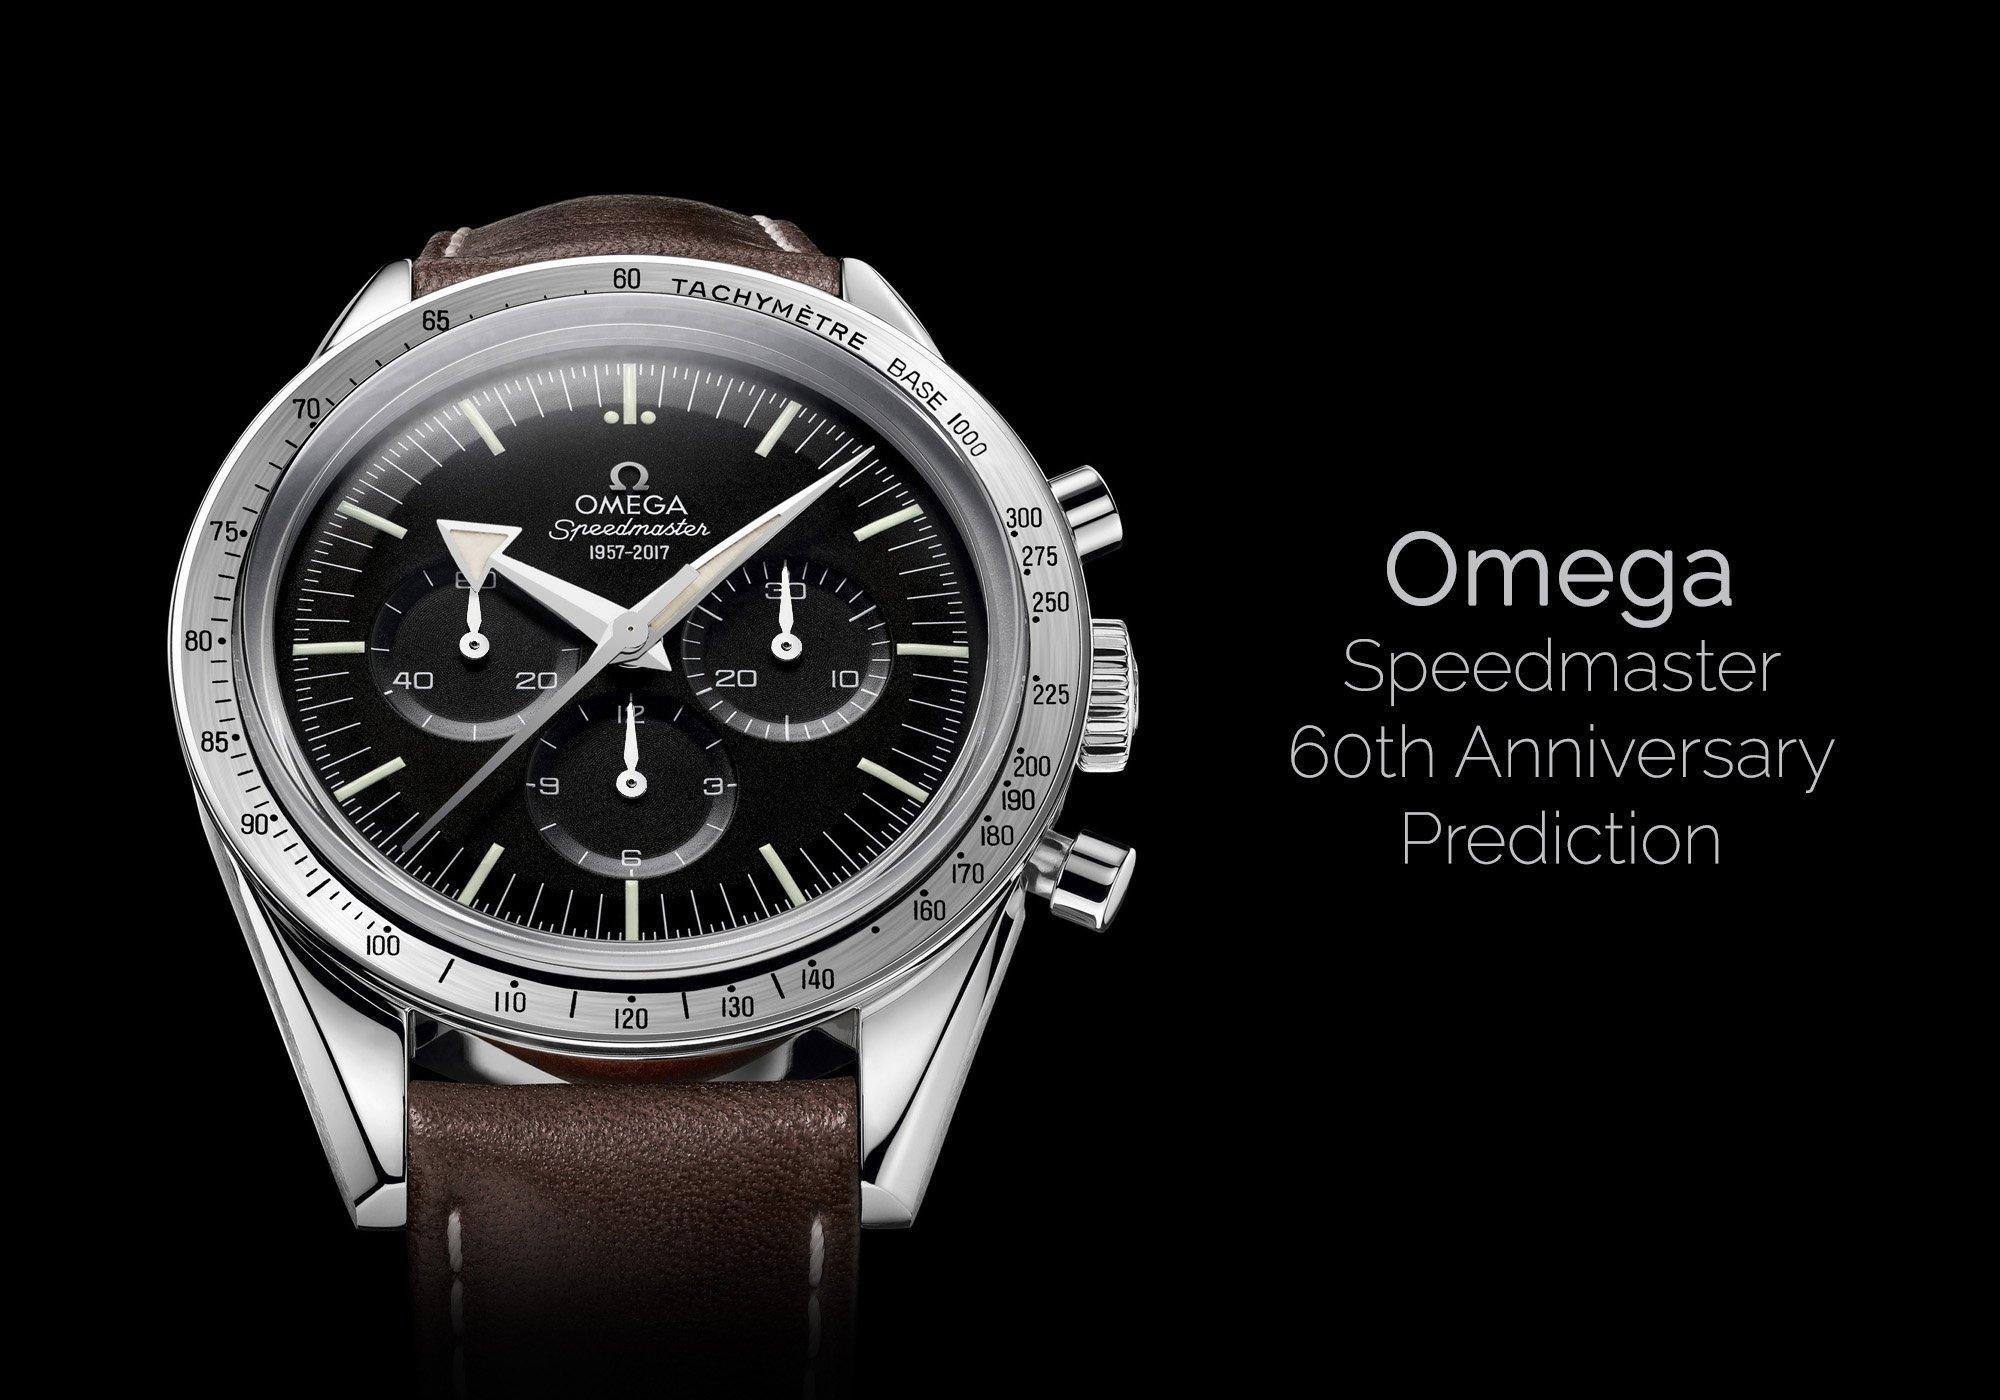 Omega Speedmaster 60th Anniversary Prediction - Omega Baselworld 2017